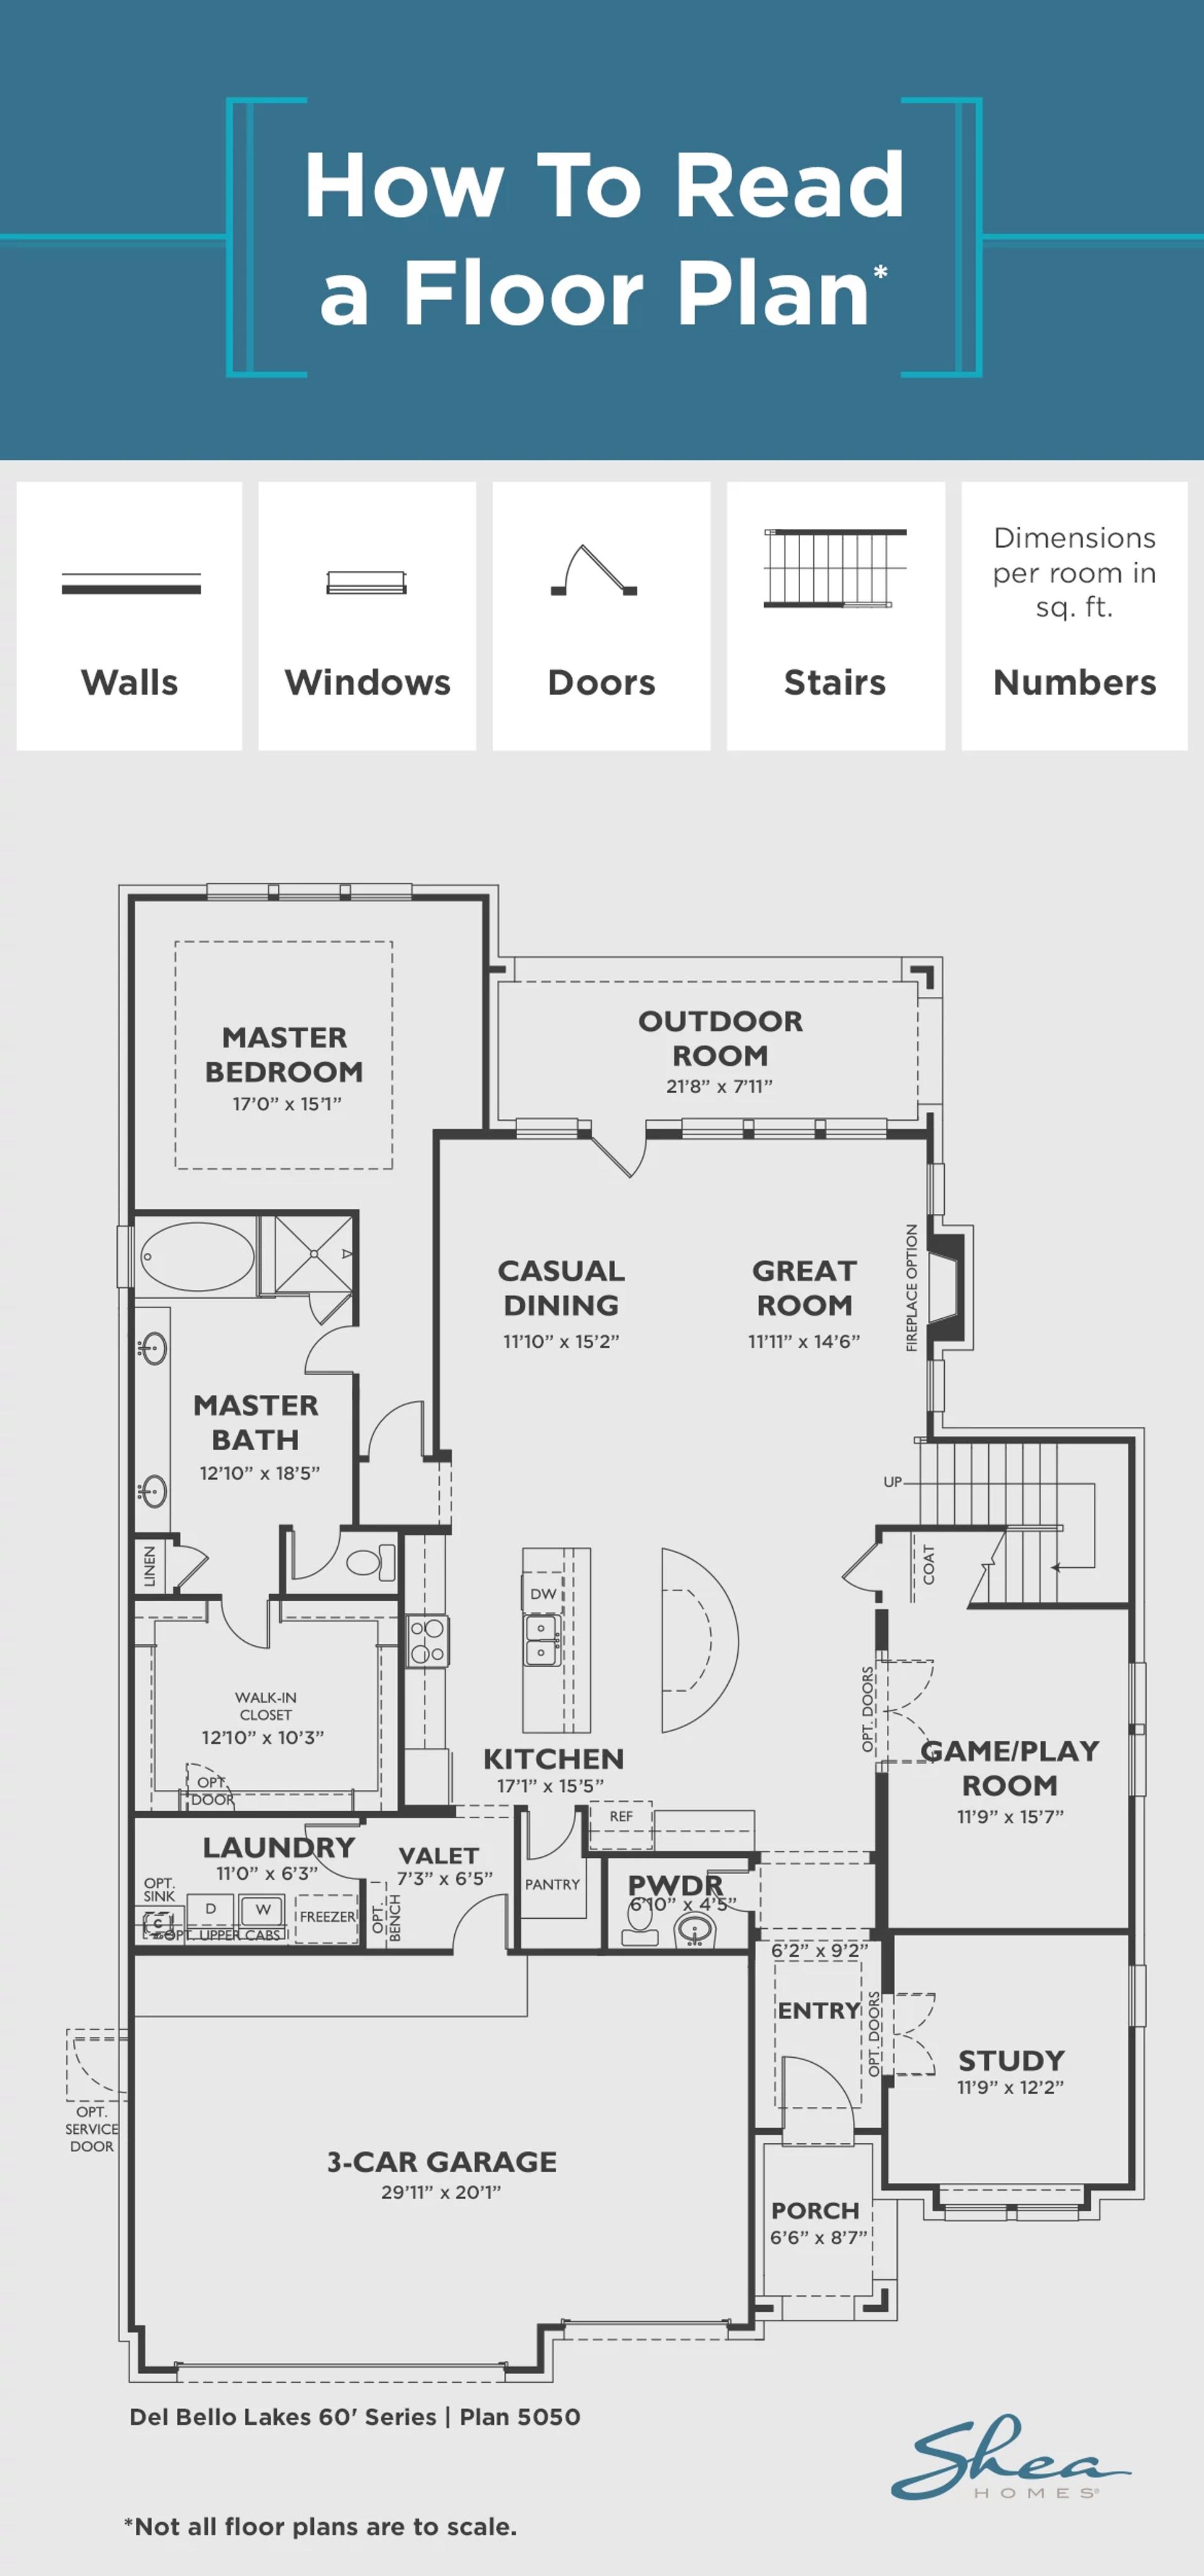 SHEA-Choosing-FloorPlan-Infographic-Key (2).png